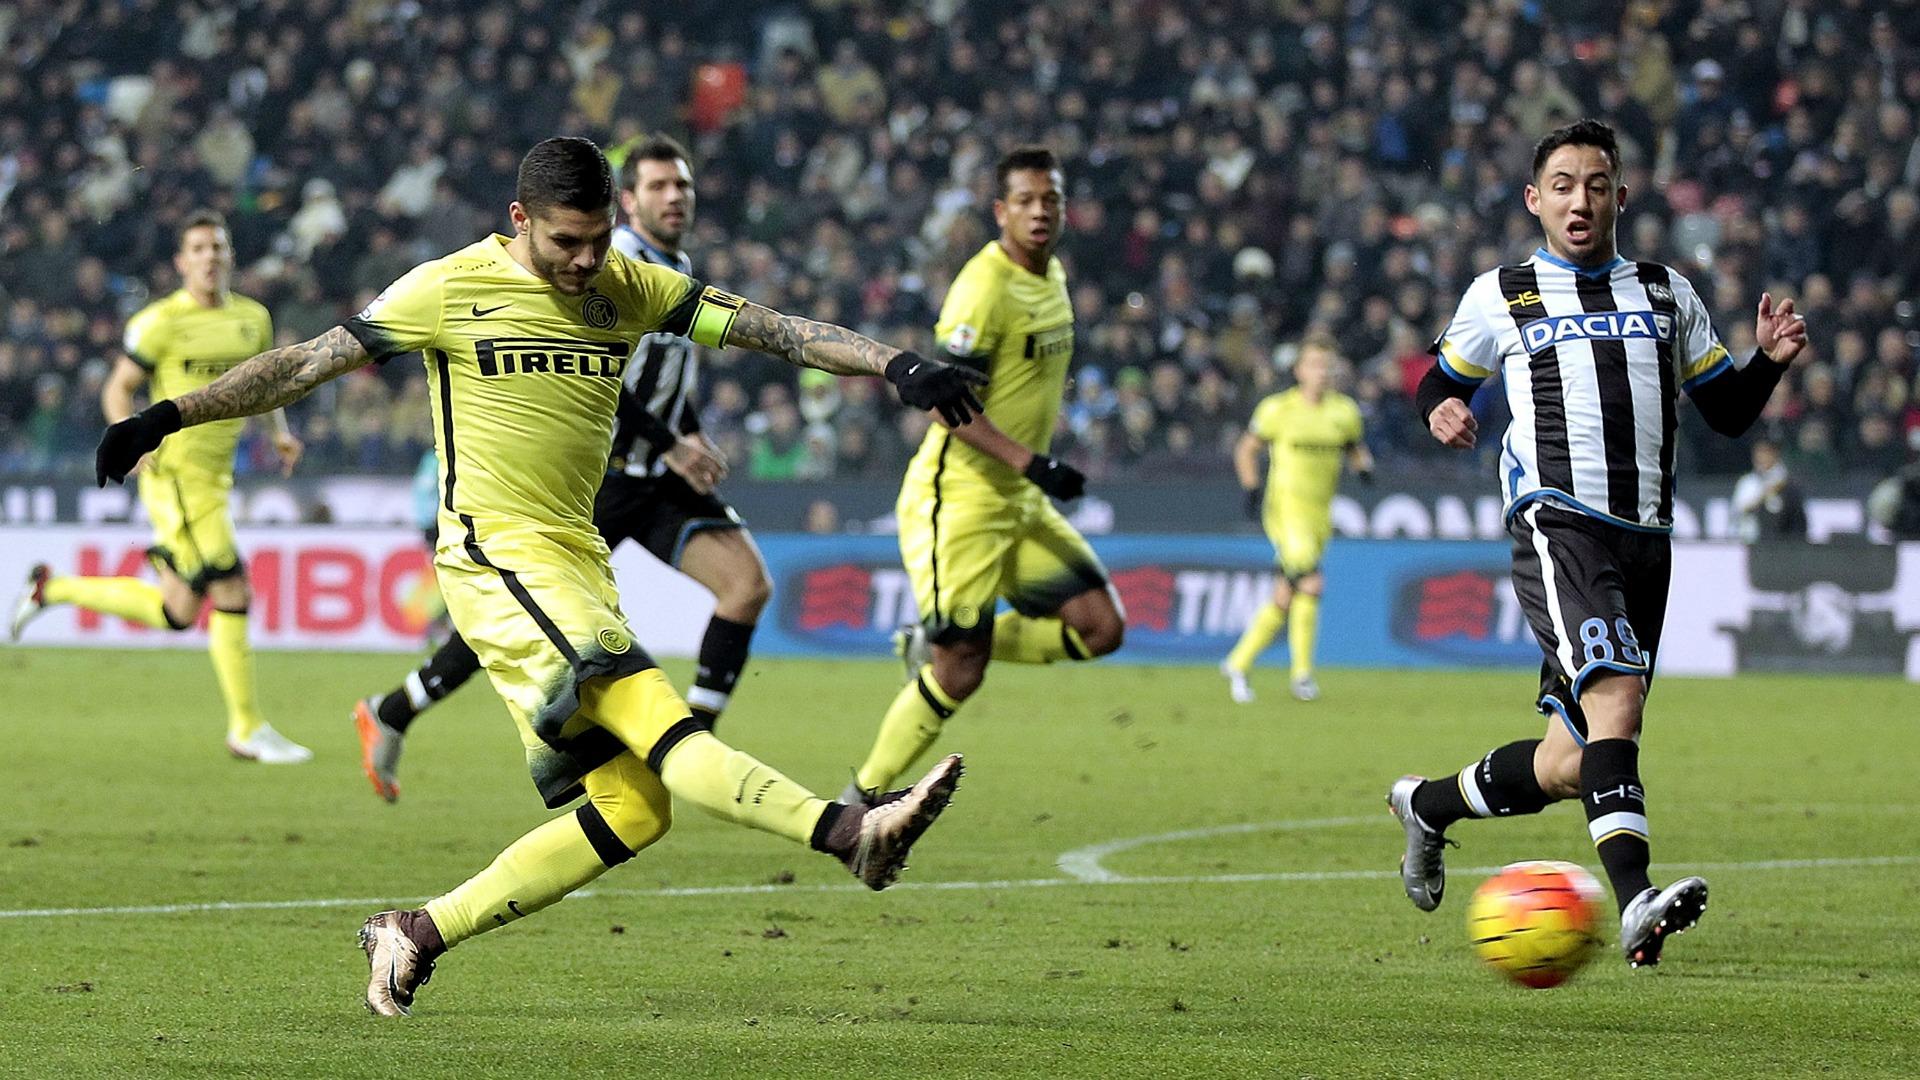 Udinese vs Internazionale